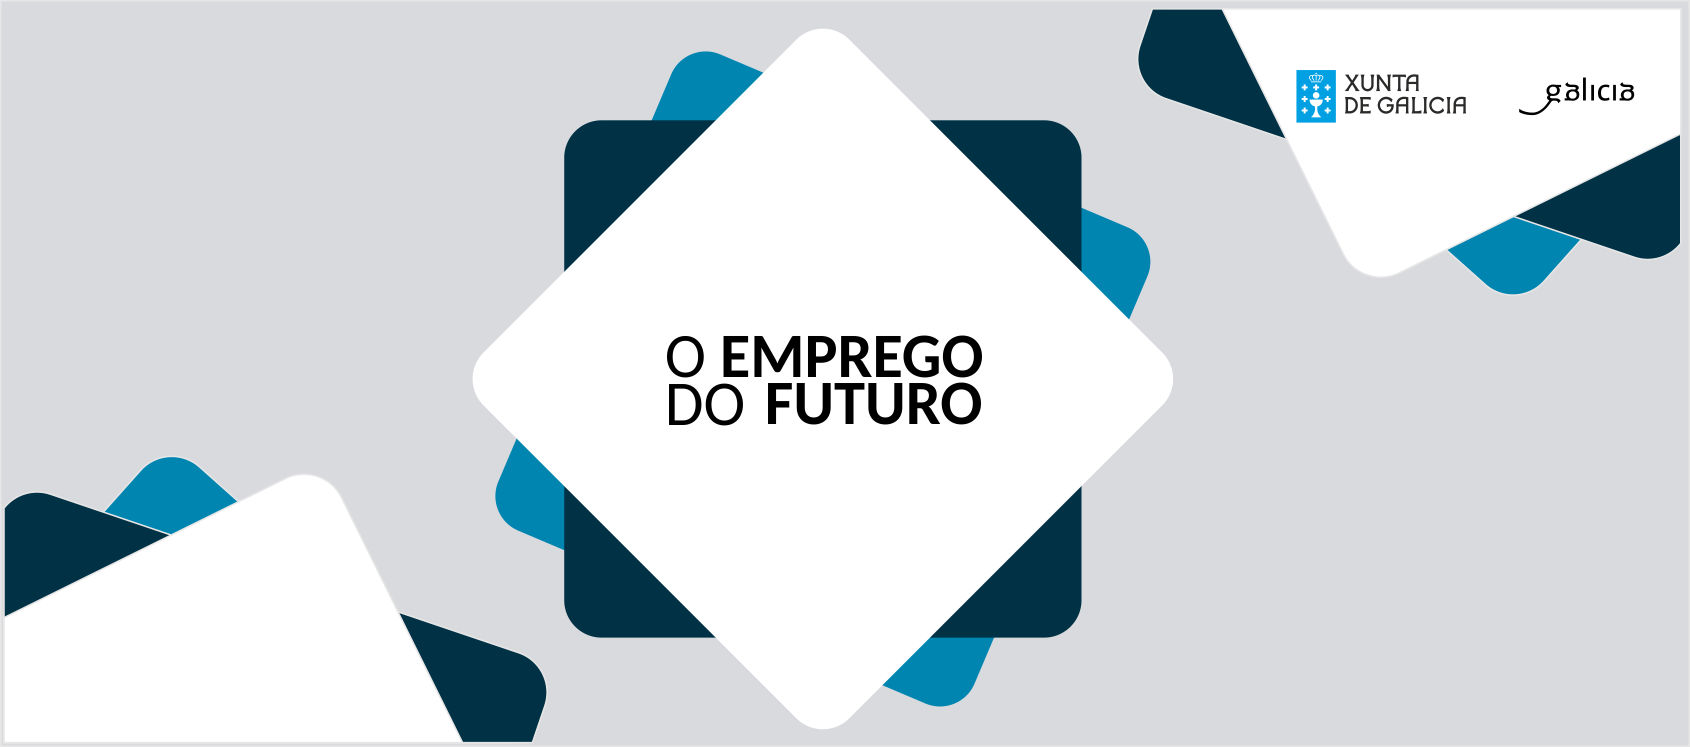 EMPREGO DE FUTURO